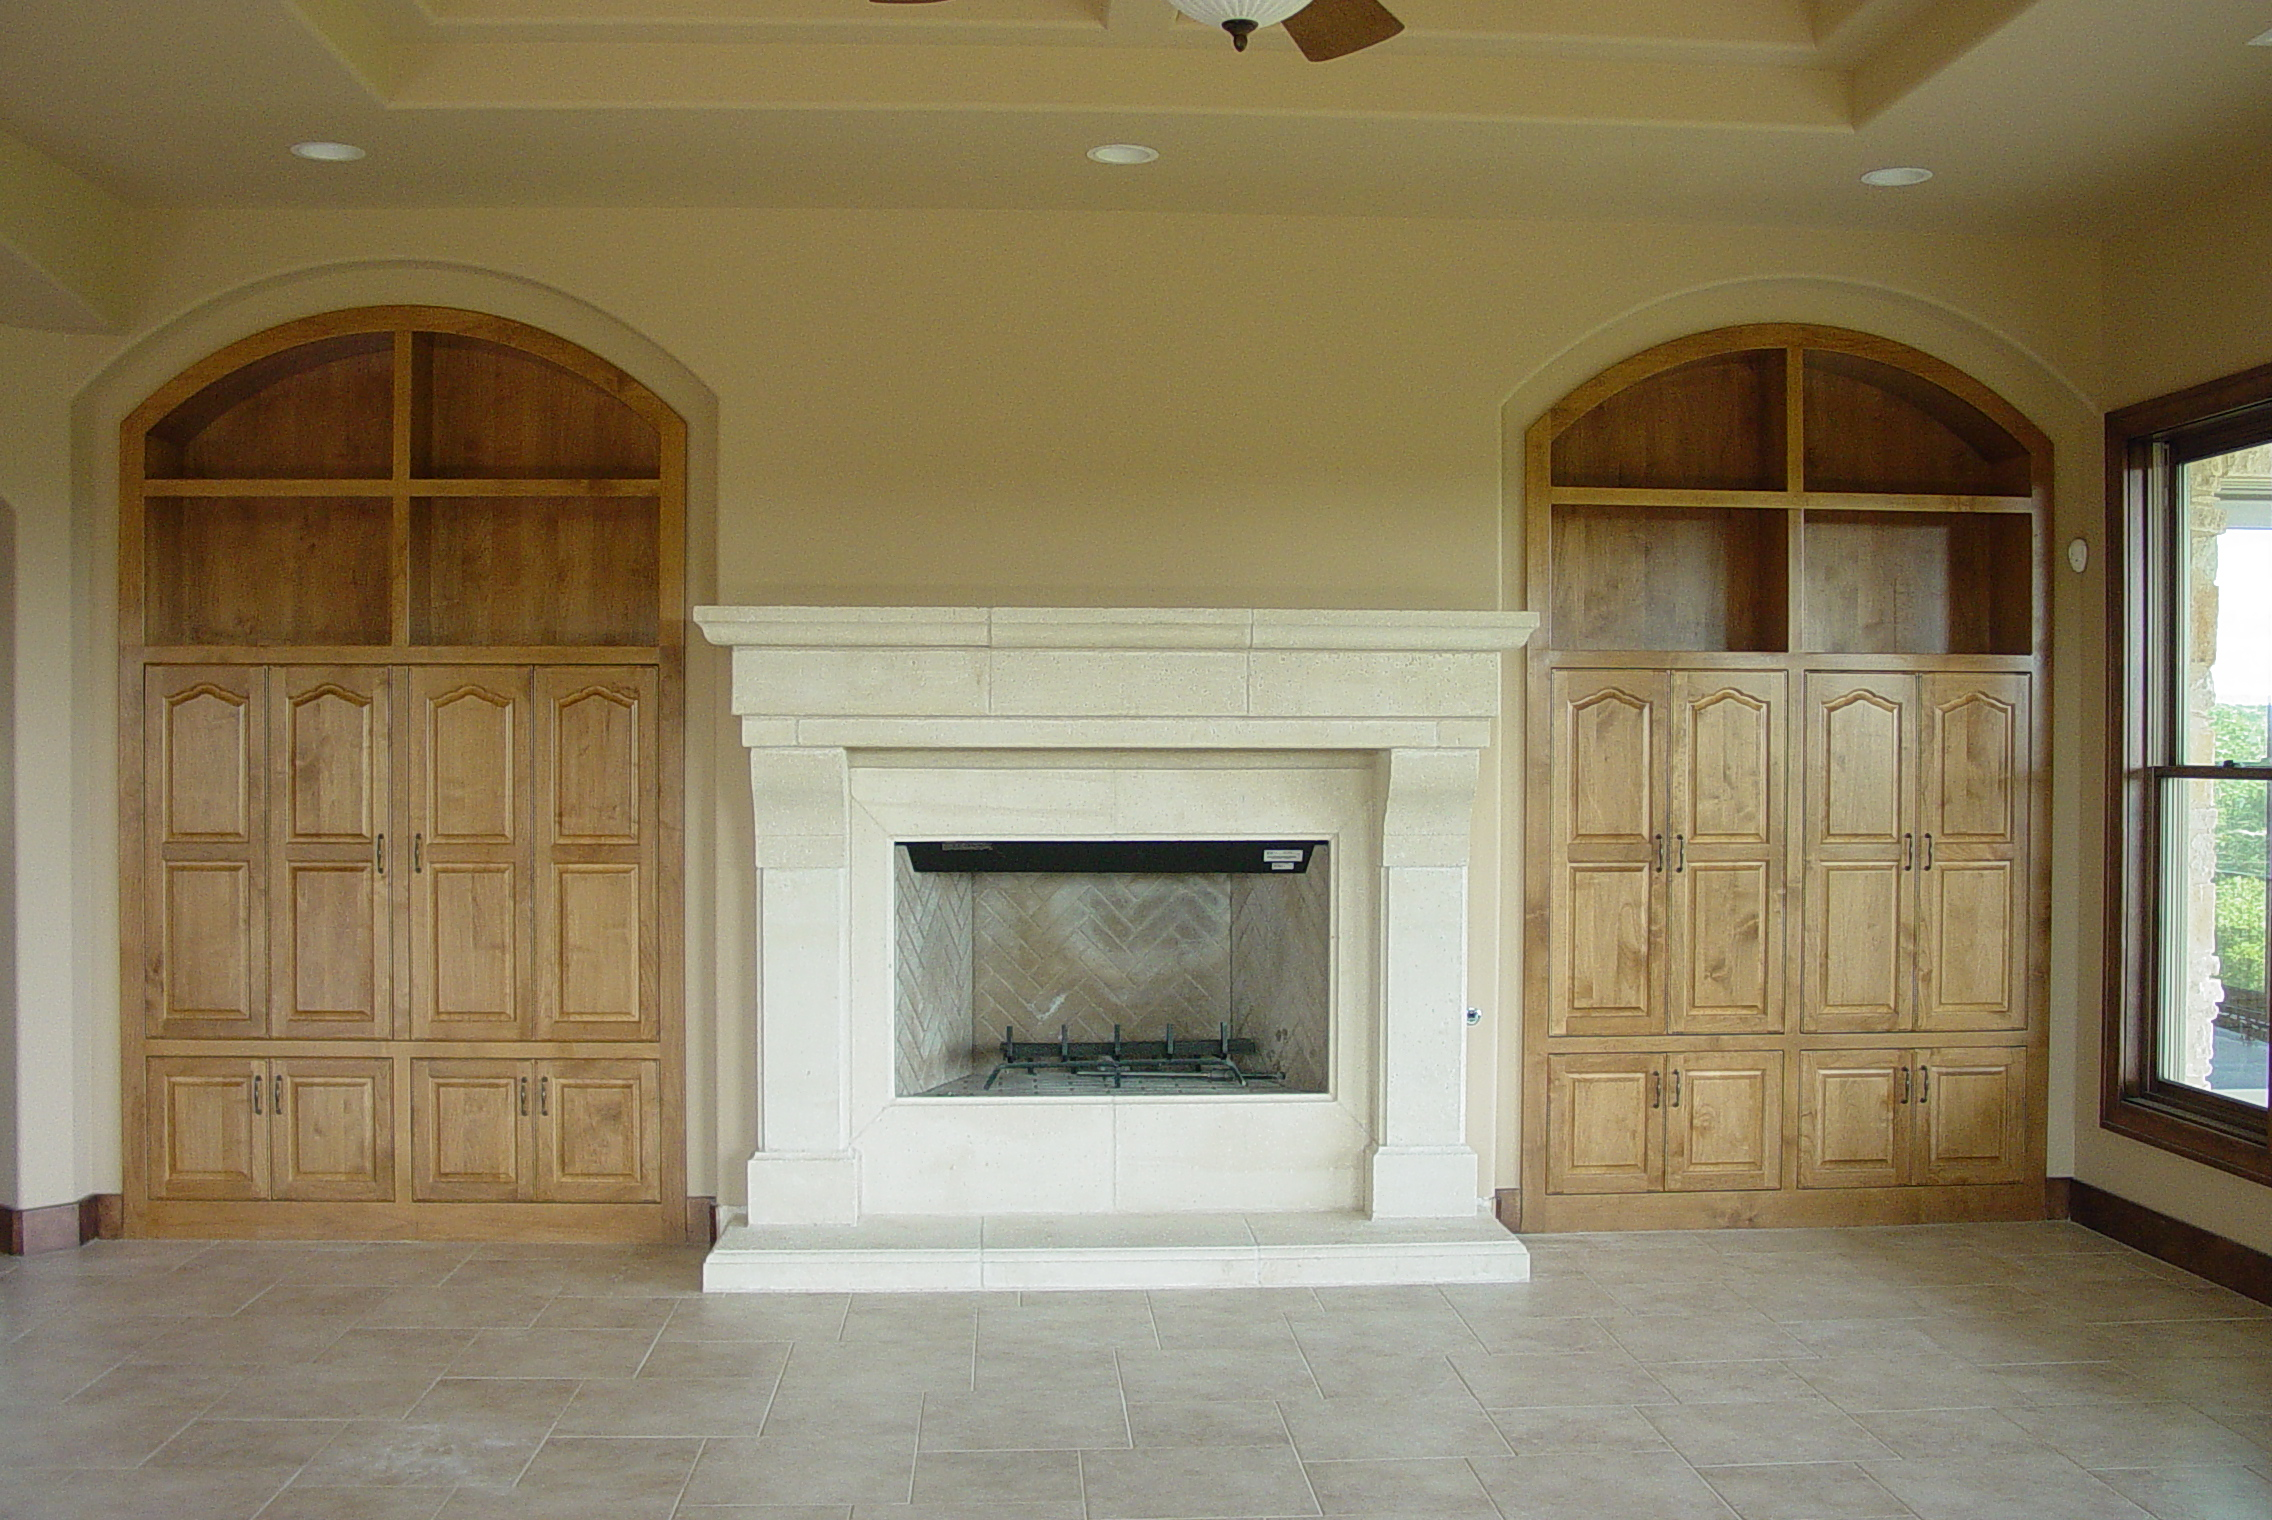 interiors001.jpg